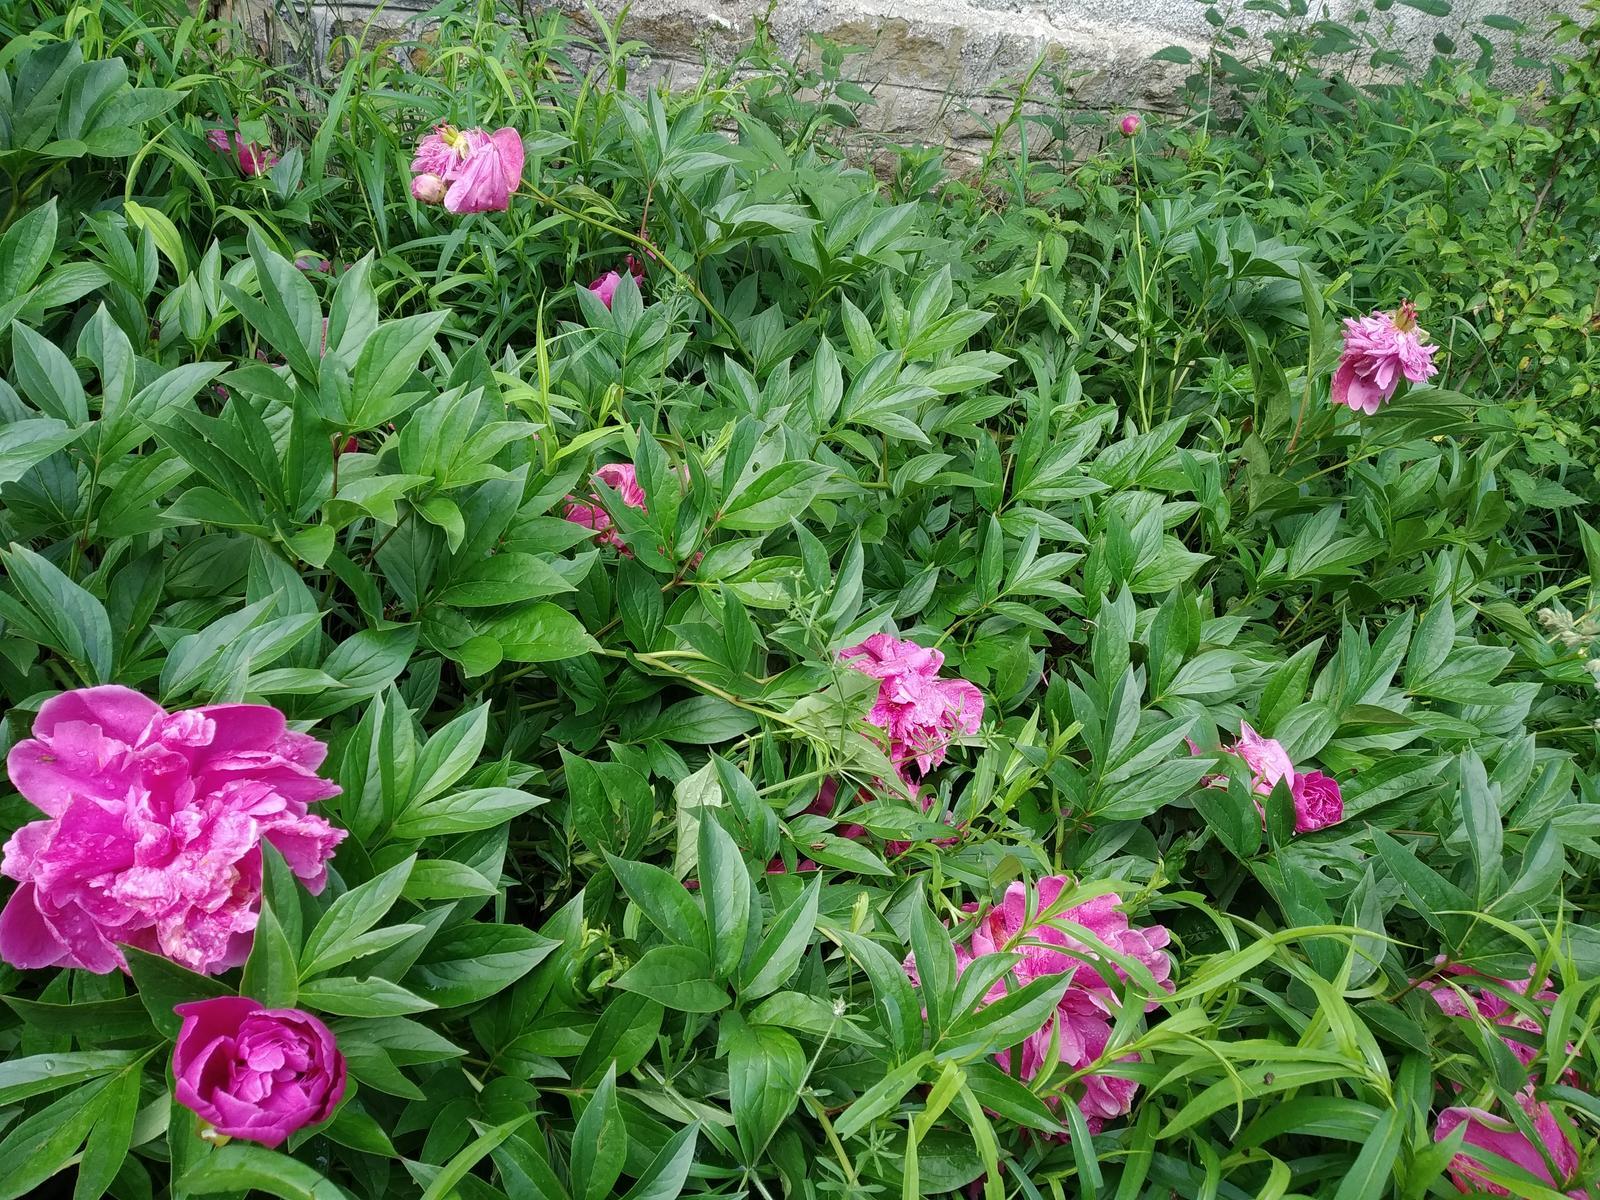 Babkina záhrada - Pri starom dome, babkinom rodičovskom;-)